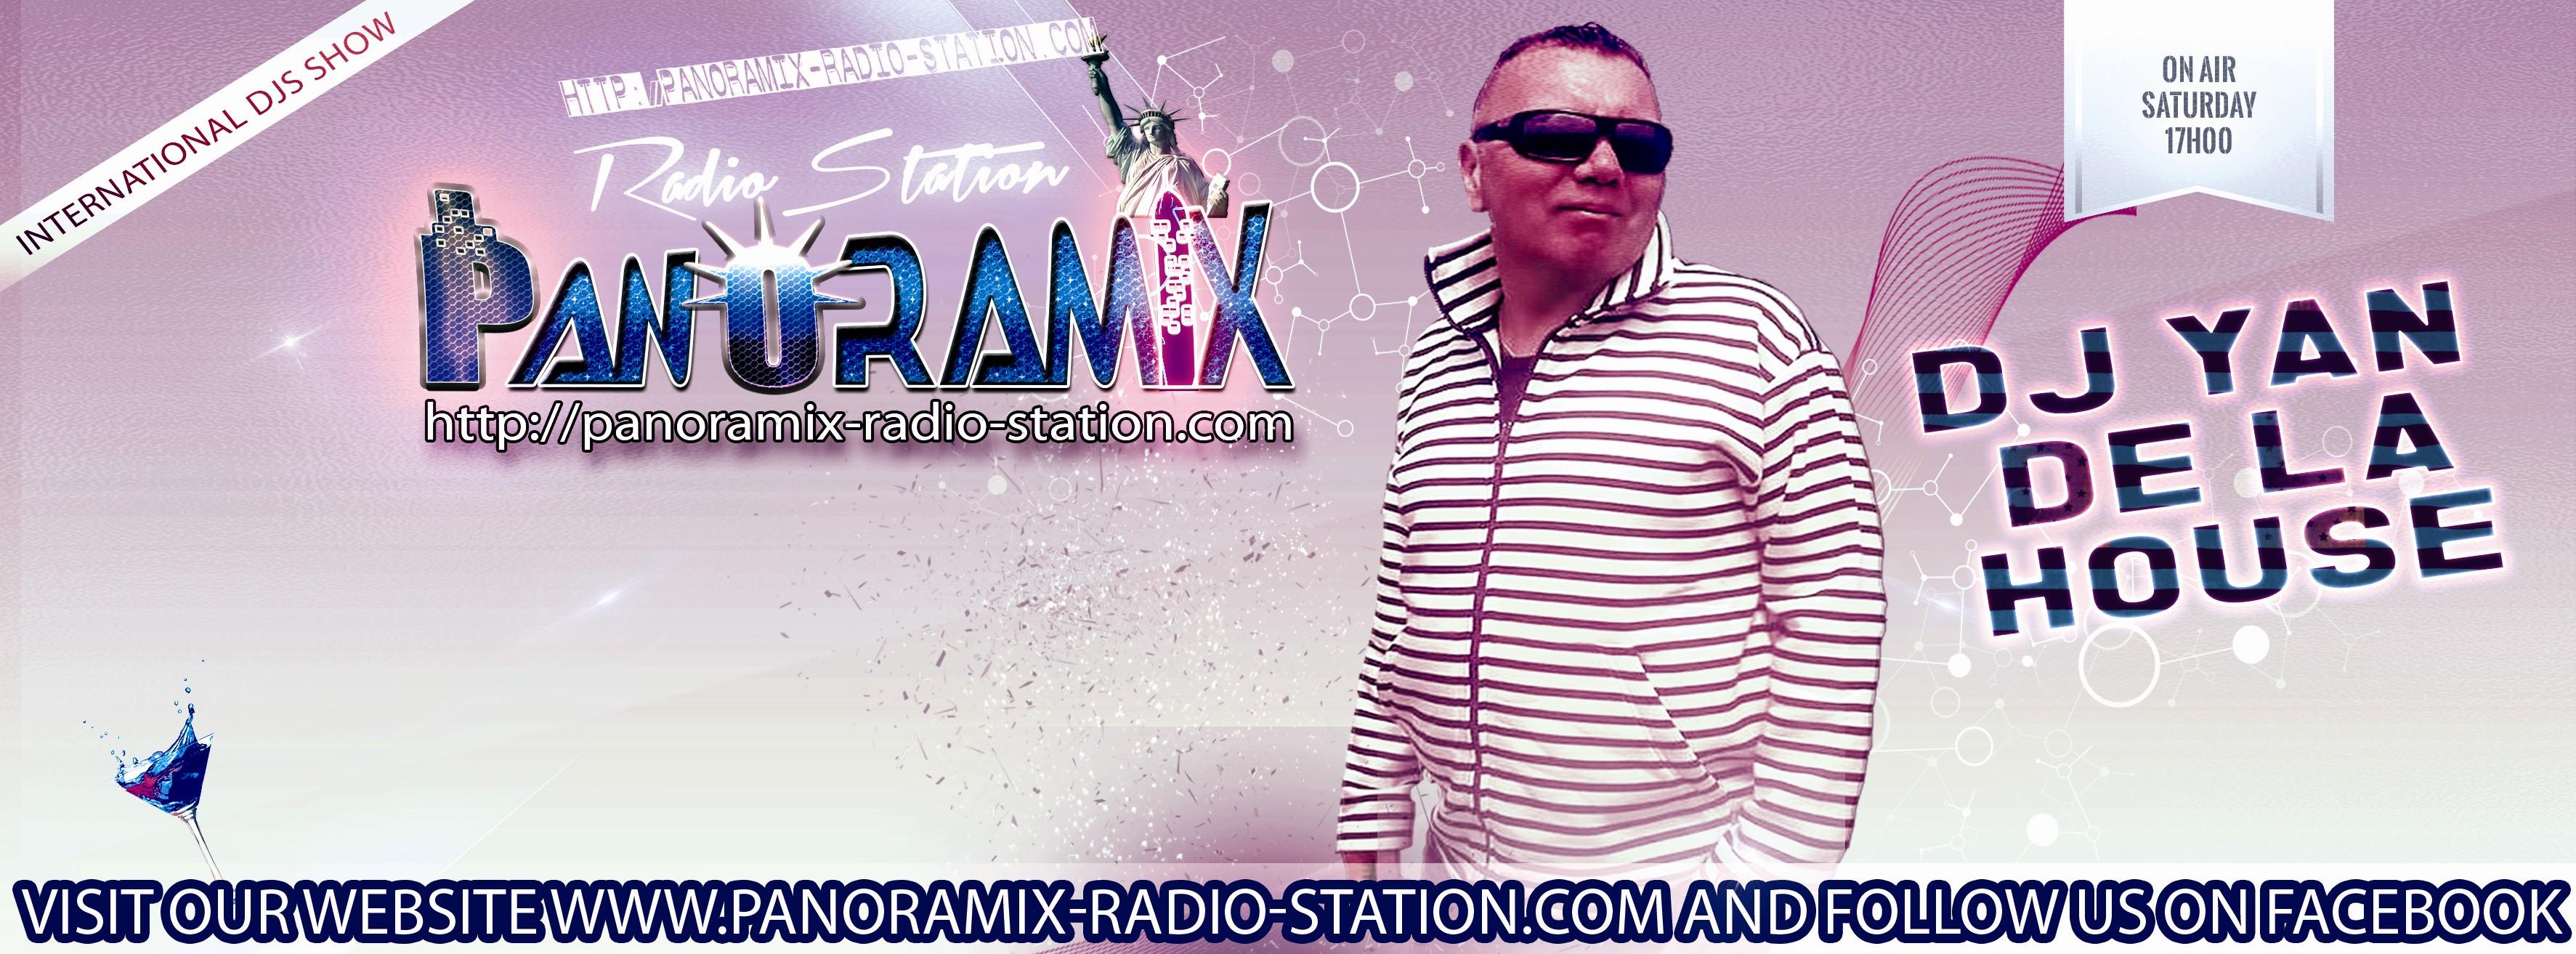 http://panoramix-radio-station.com/wp-content/uploads/2018/07/BANNIERE-2-DJ-YAN-HOUSE-panoramix-Récupéré.jpg